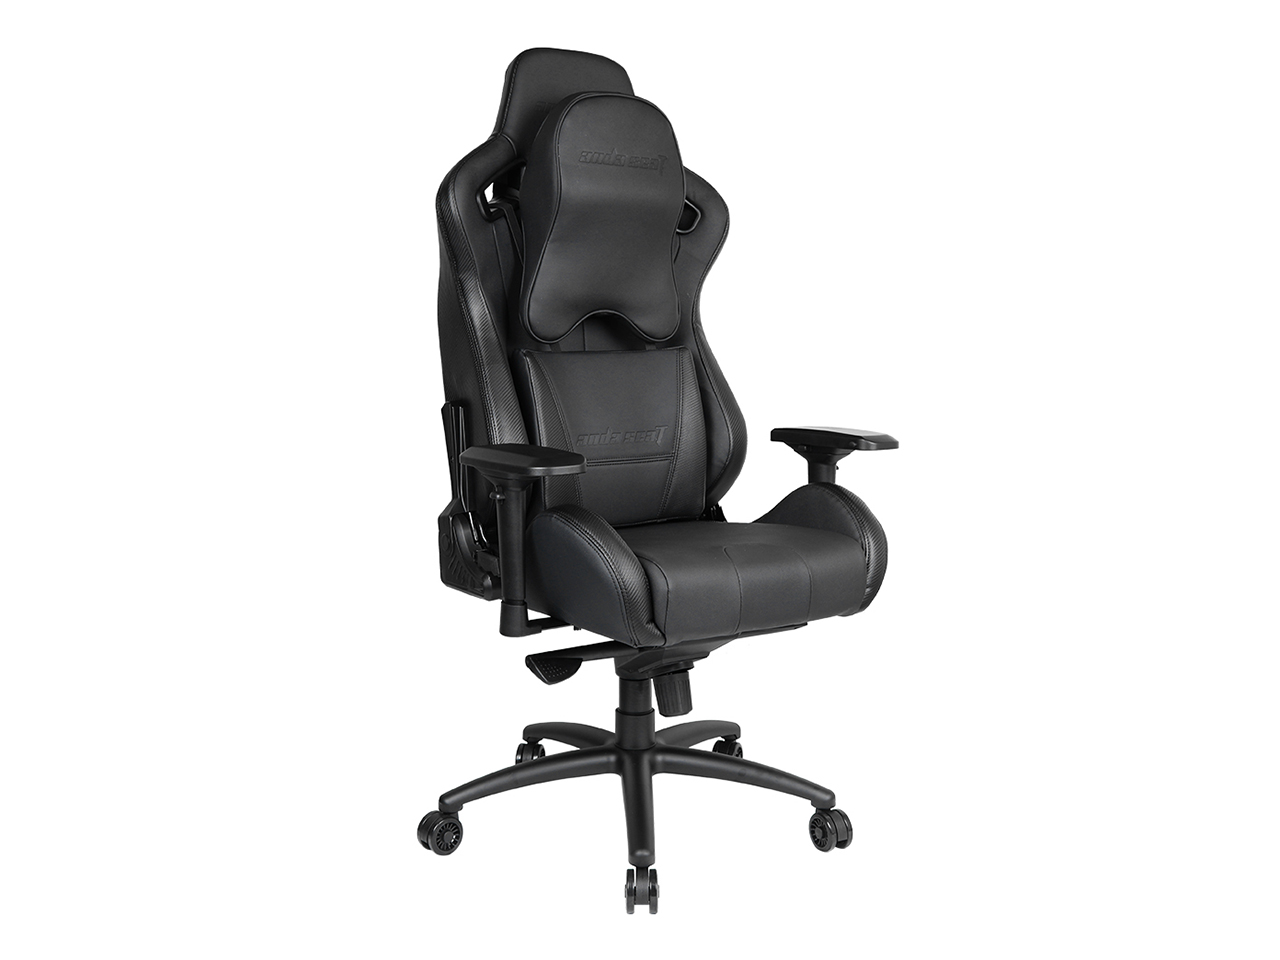 Anda Seat Dark Series High-Back Gaming Chair Recliner & Swivel 400lb with Headrest & Lumbar Support Large, Big & Tall (Black) AD12XL-DARK-B-PV-PRO